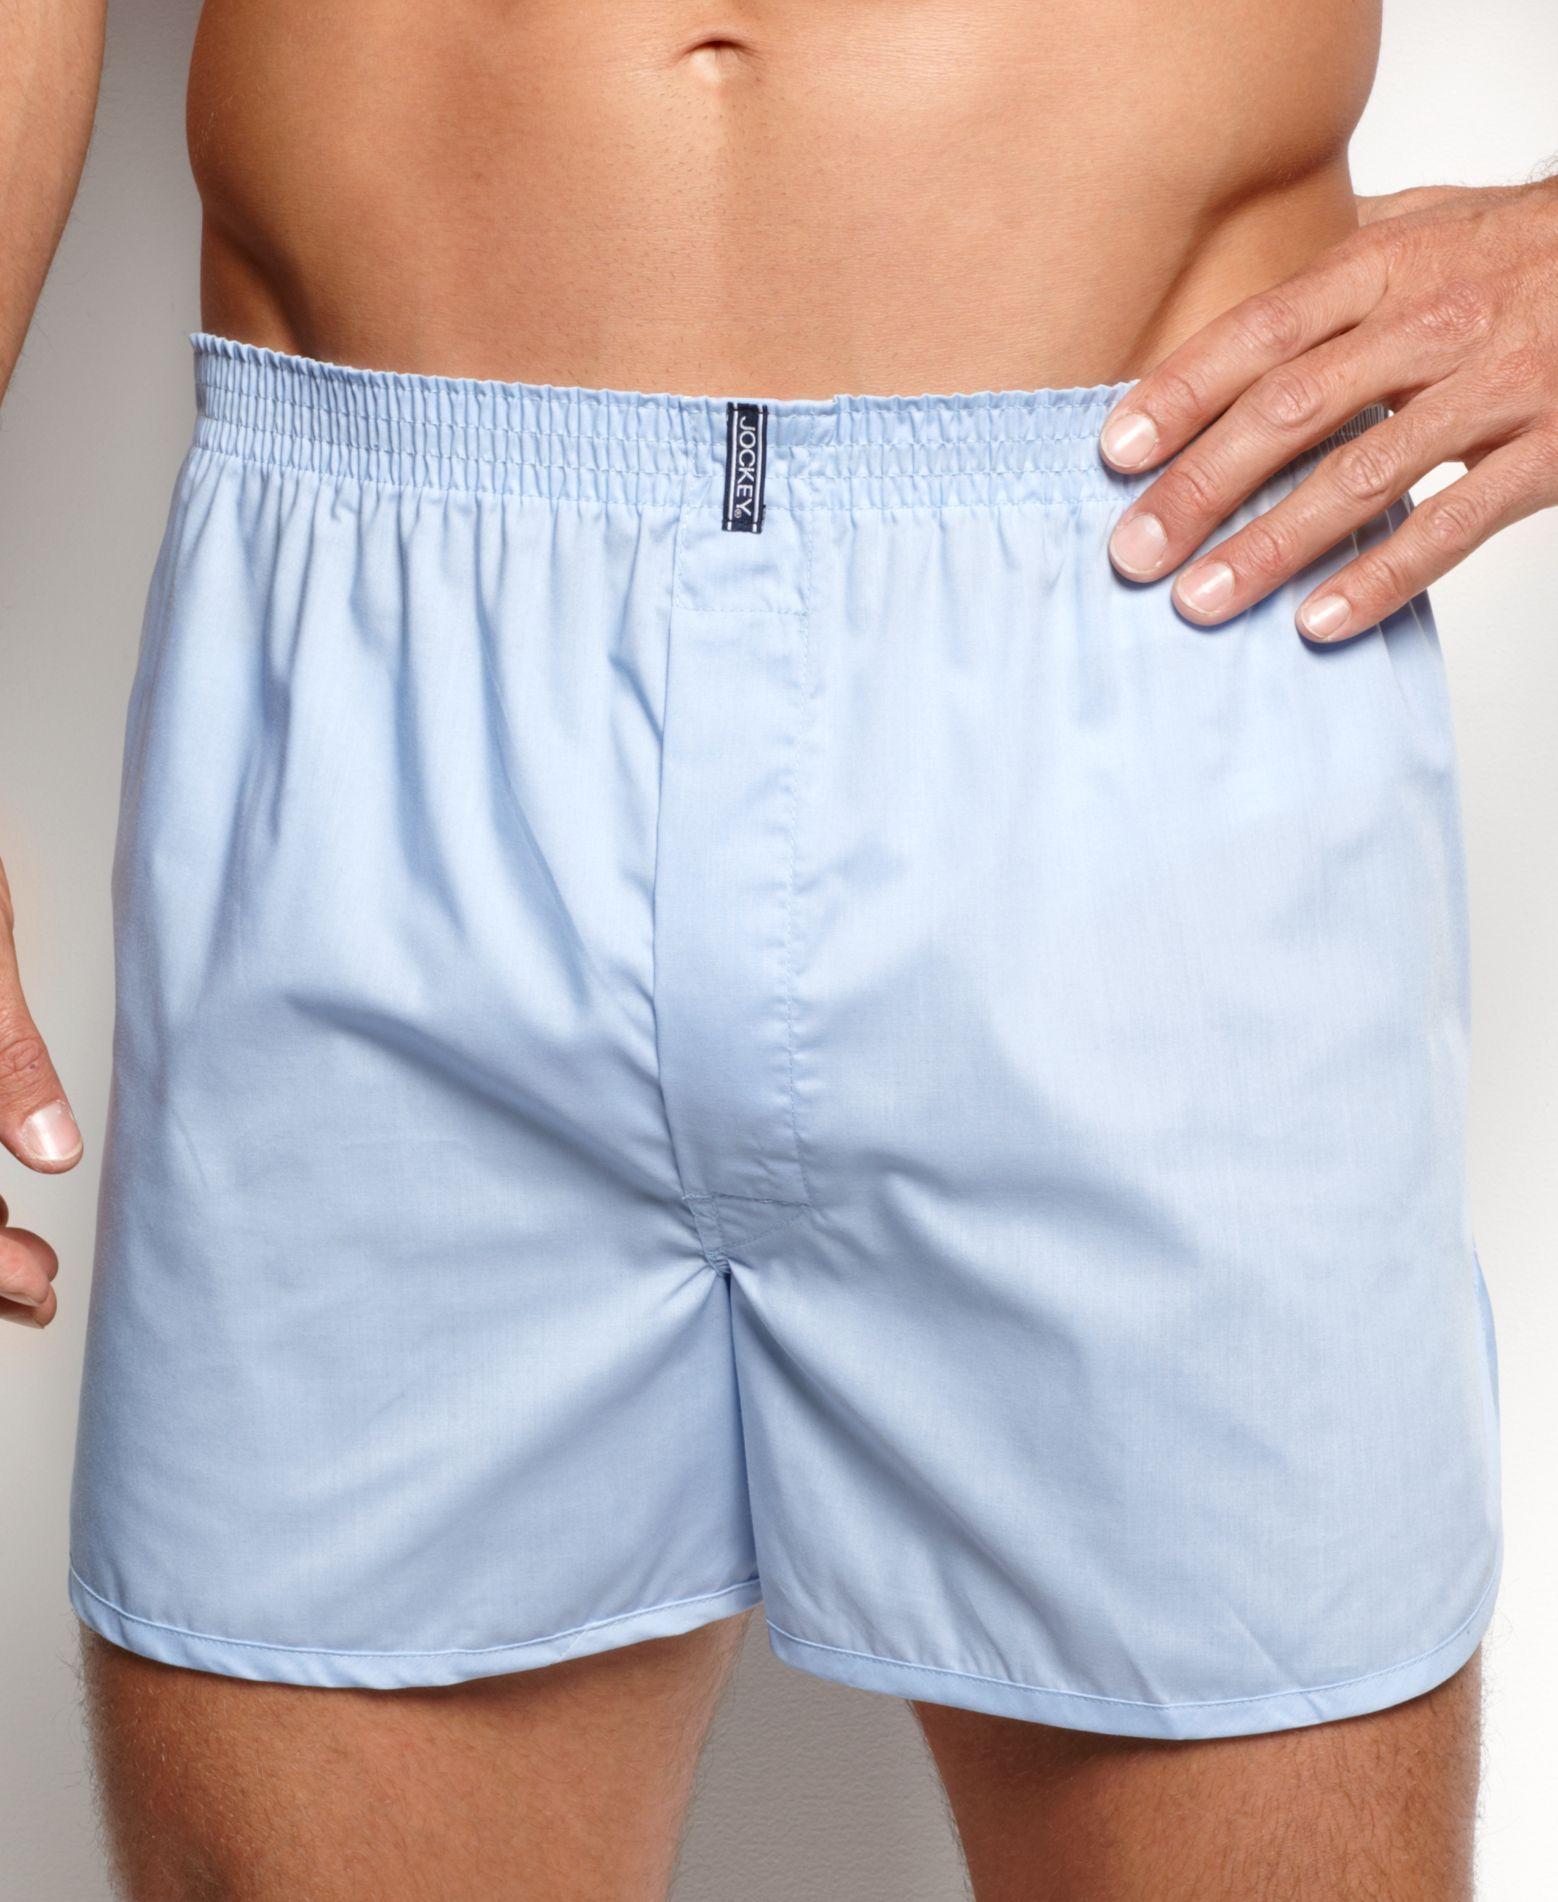 126b2056b495 Men's Underwear, Classic Tapered Boxer 4 Pack | jockey | Jockey ...